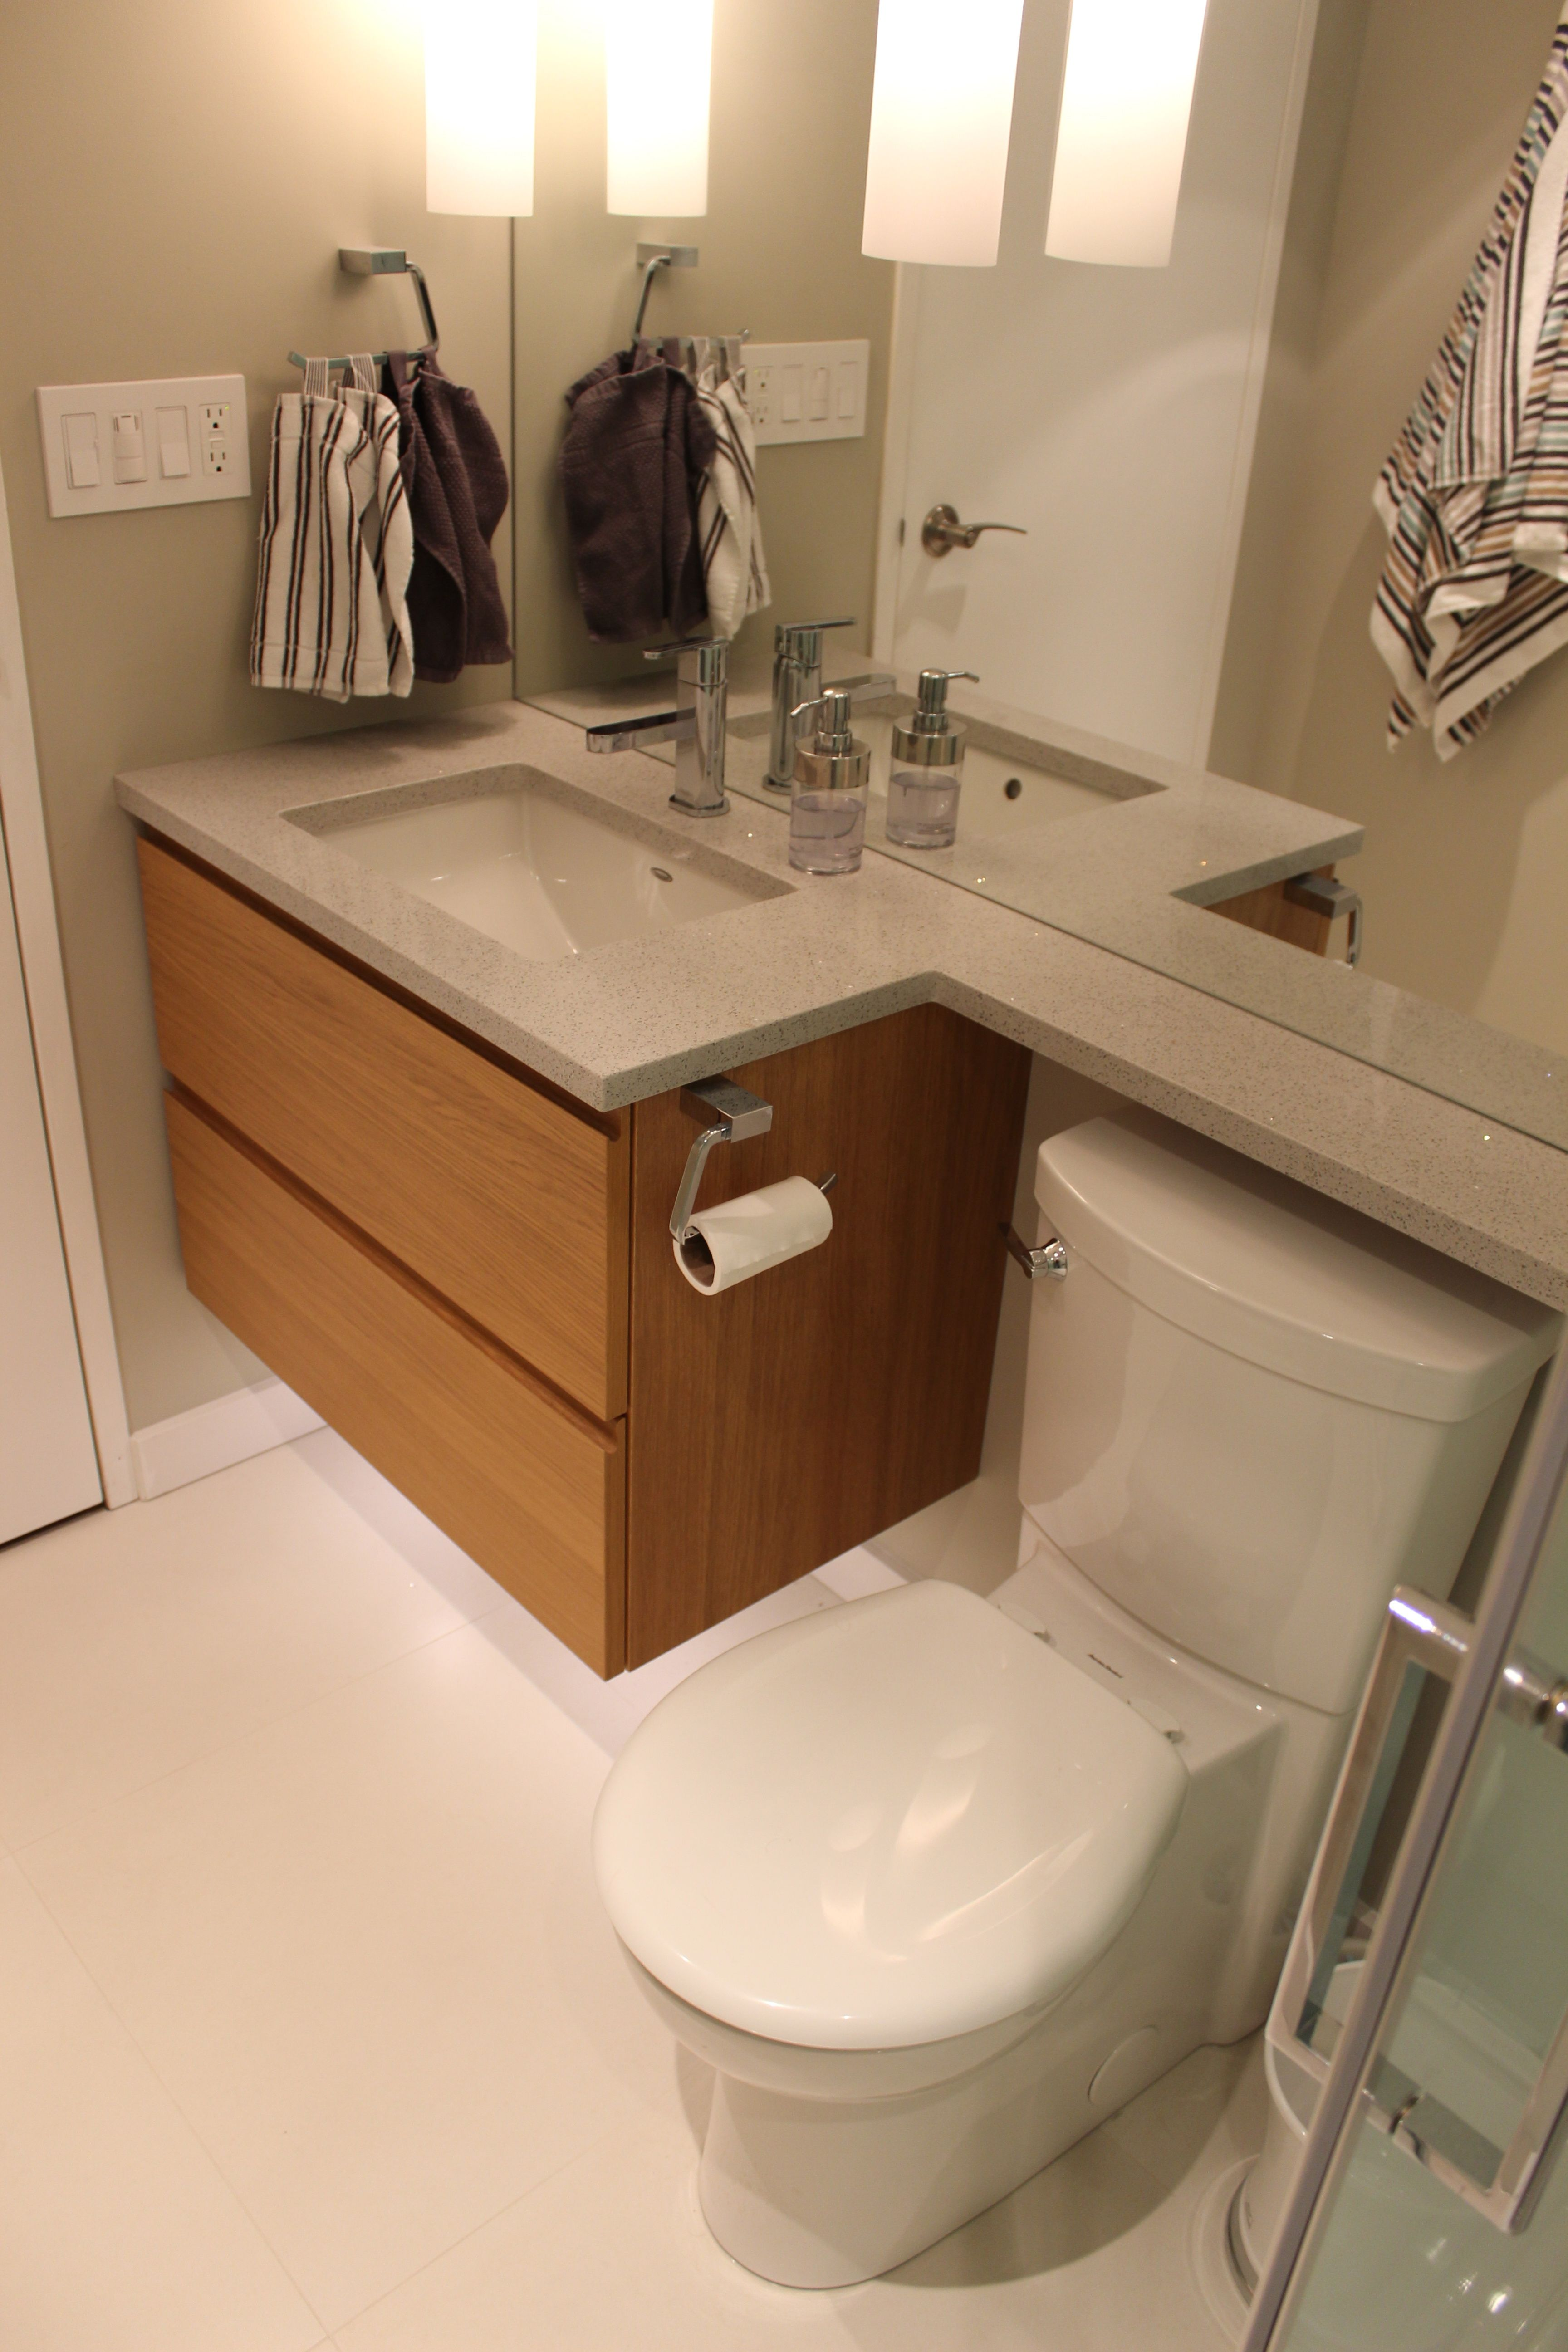 Condo Bathroom Renovation Modern Beautiful And Compact Bathroom Renovation Cost Beautiful Bathroom Designs Bathroom Design